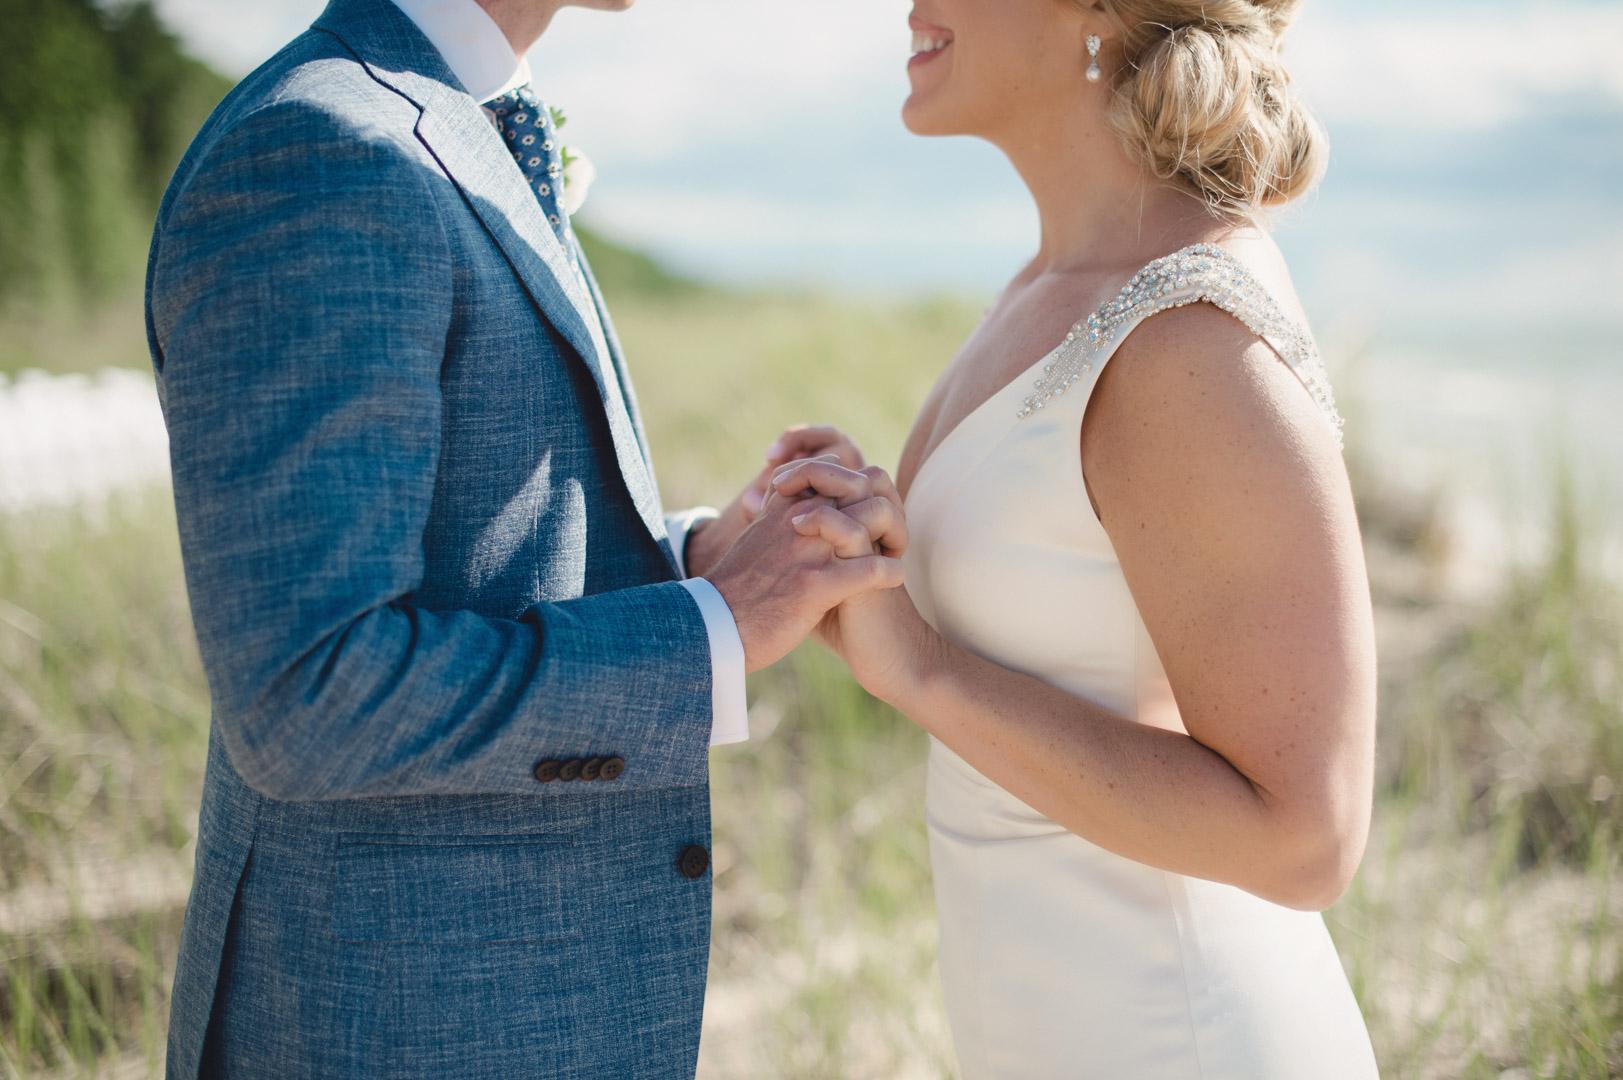 Beach-wedding-lake-michigan-366.jpg